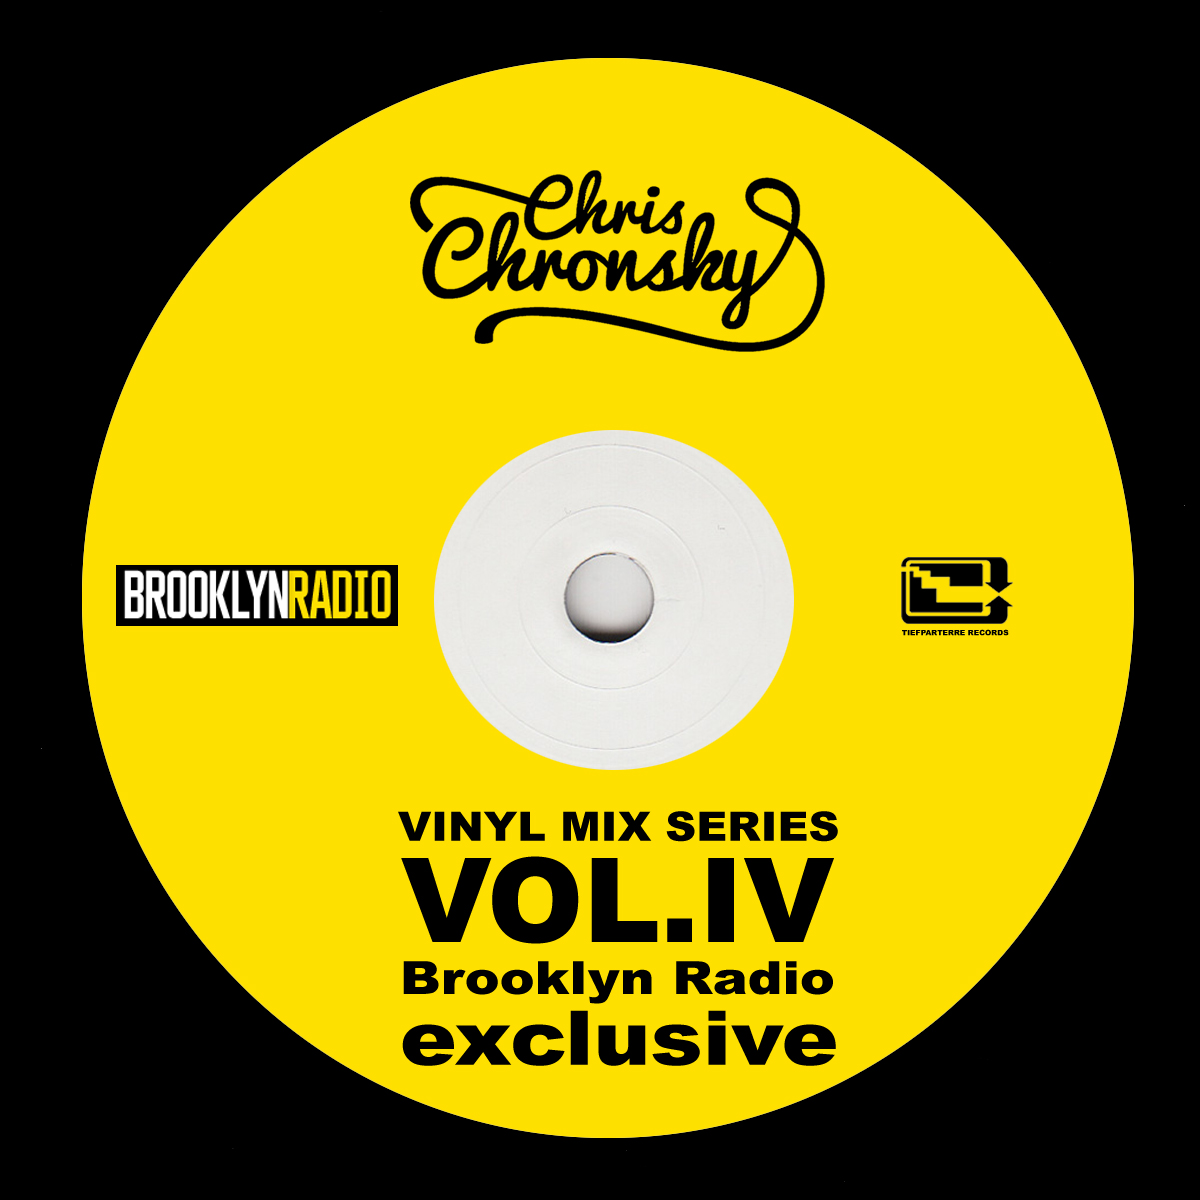 VINYL MIX SERIES Brooklyn Radio Exclusive.jpg